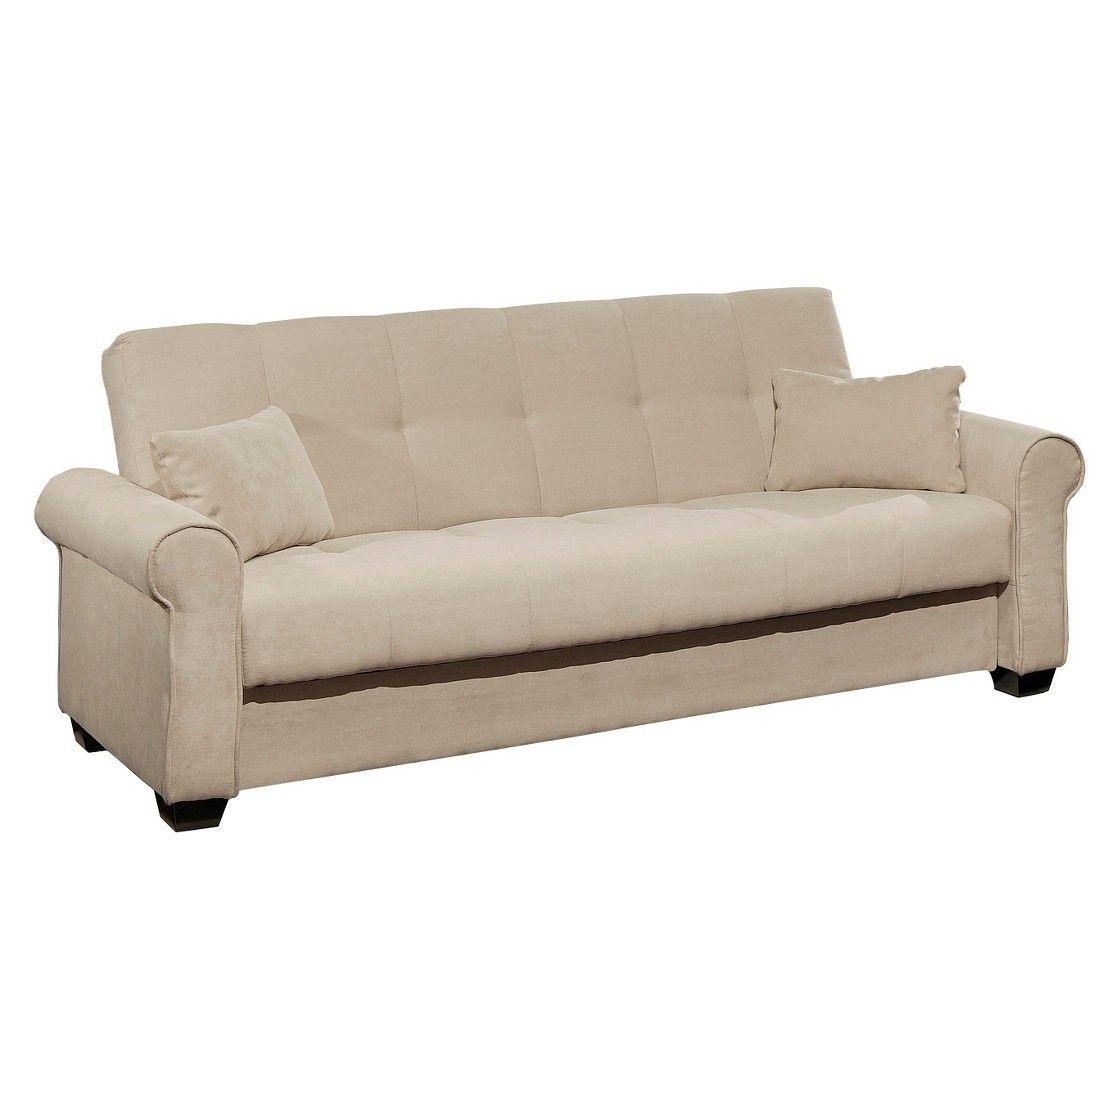 Abbyson living maya convertible sofa love the options of this sofa